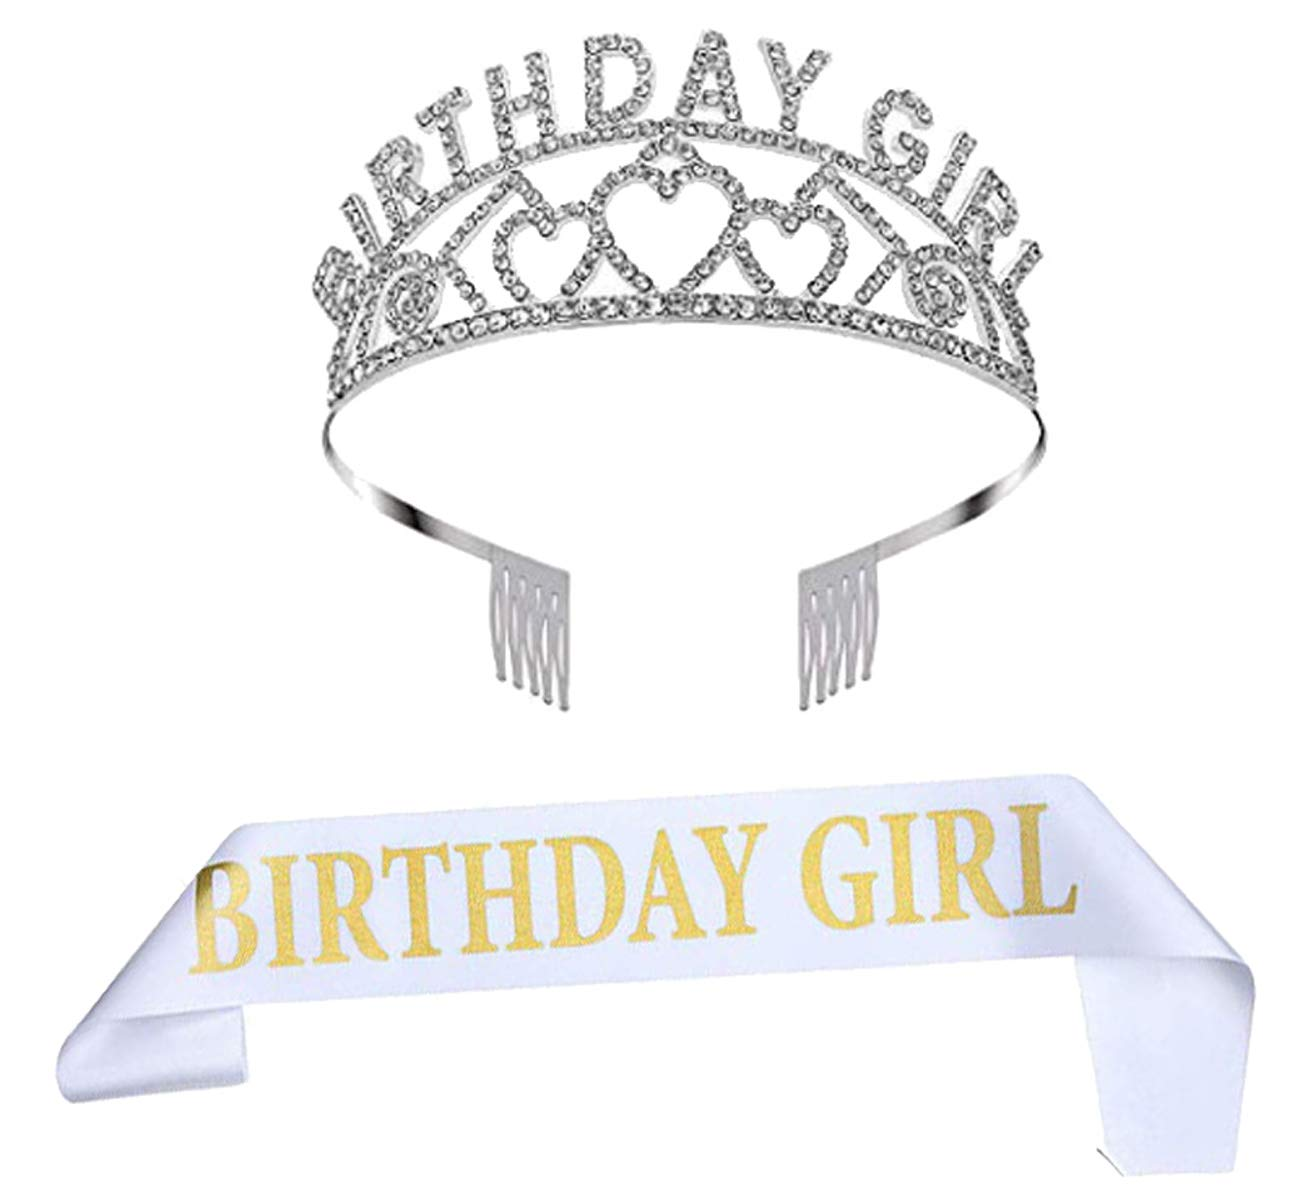 Birthday Crown Party Rhinestone Headband Prom Queen Crown Birthday Girl Sash (01) : Beauty & Personal Care